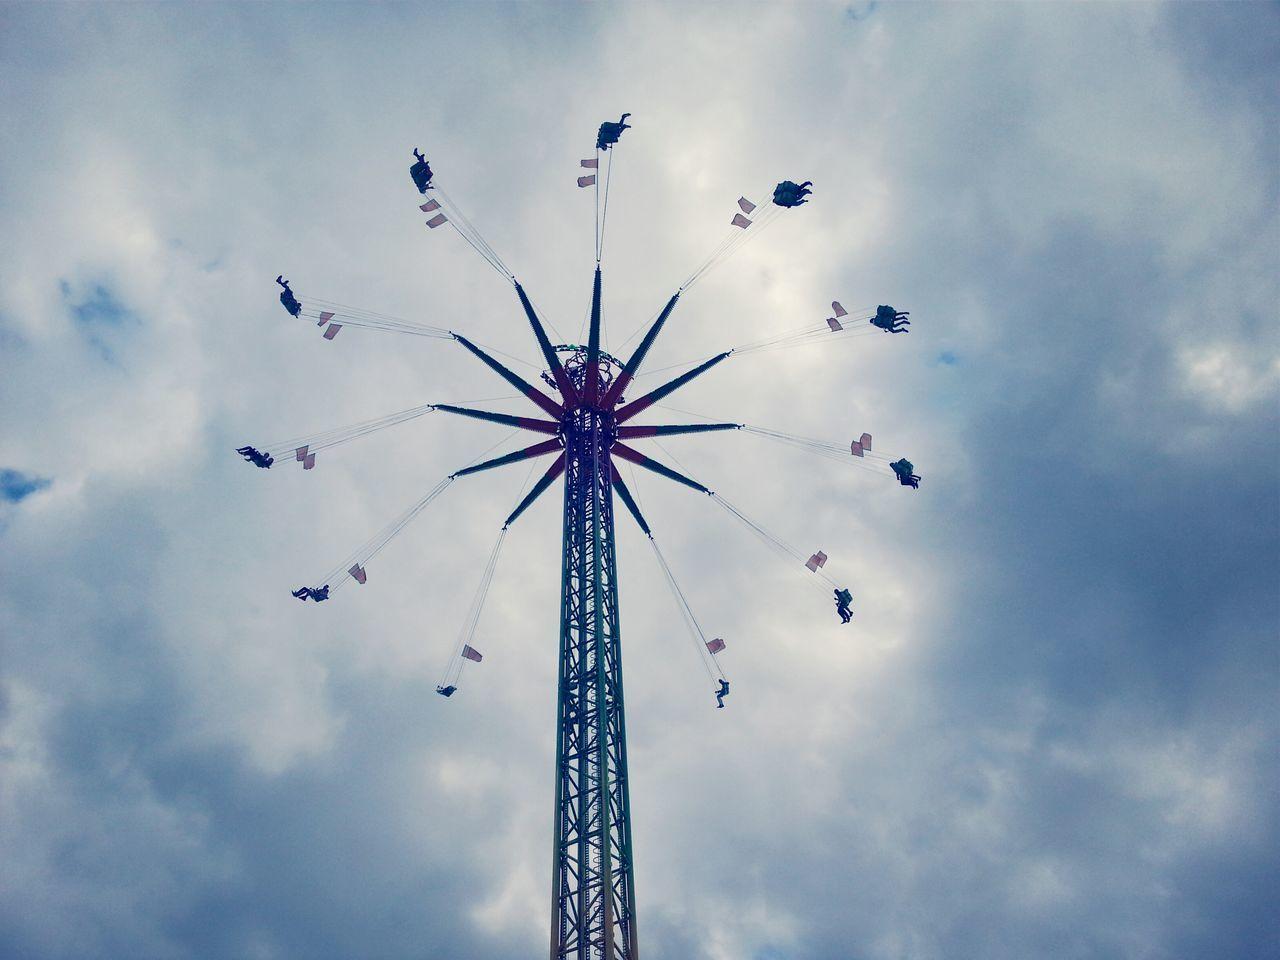 Beautiful stock photos of fun, Amusement Park Ride, Built Structure, Chain Swing Ride, Cloud